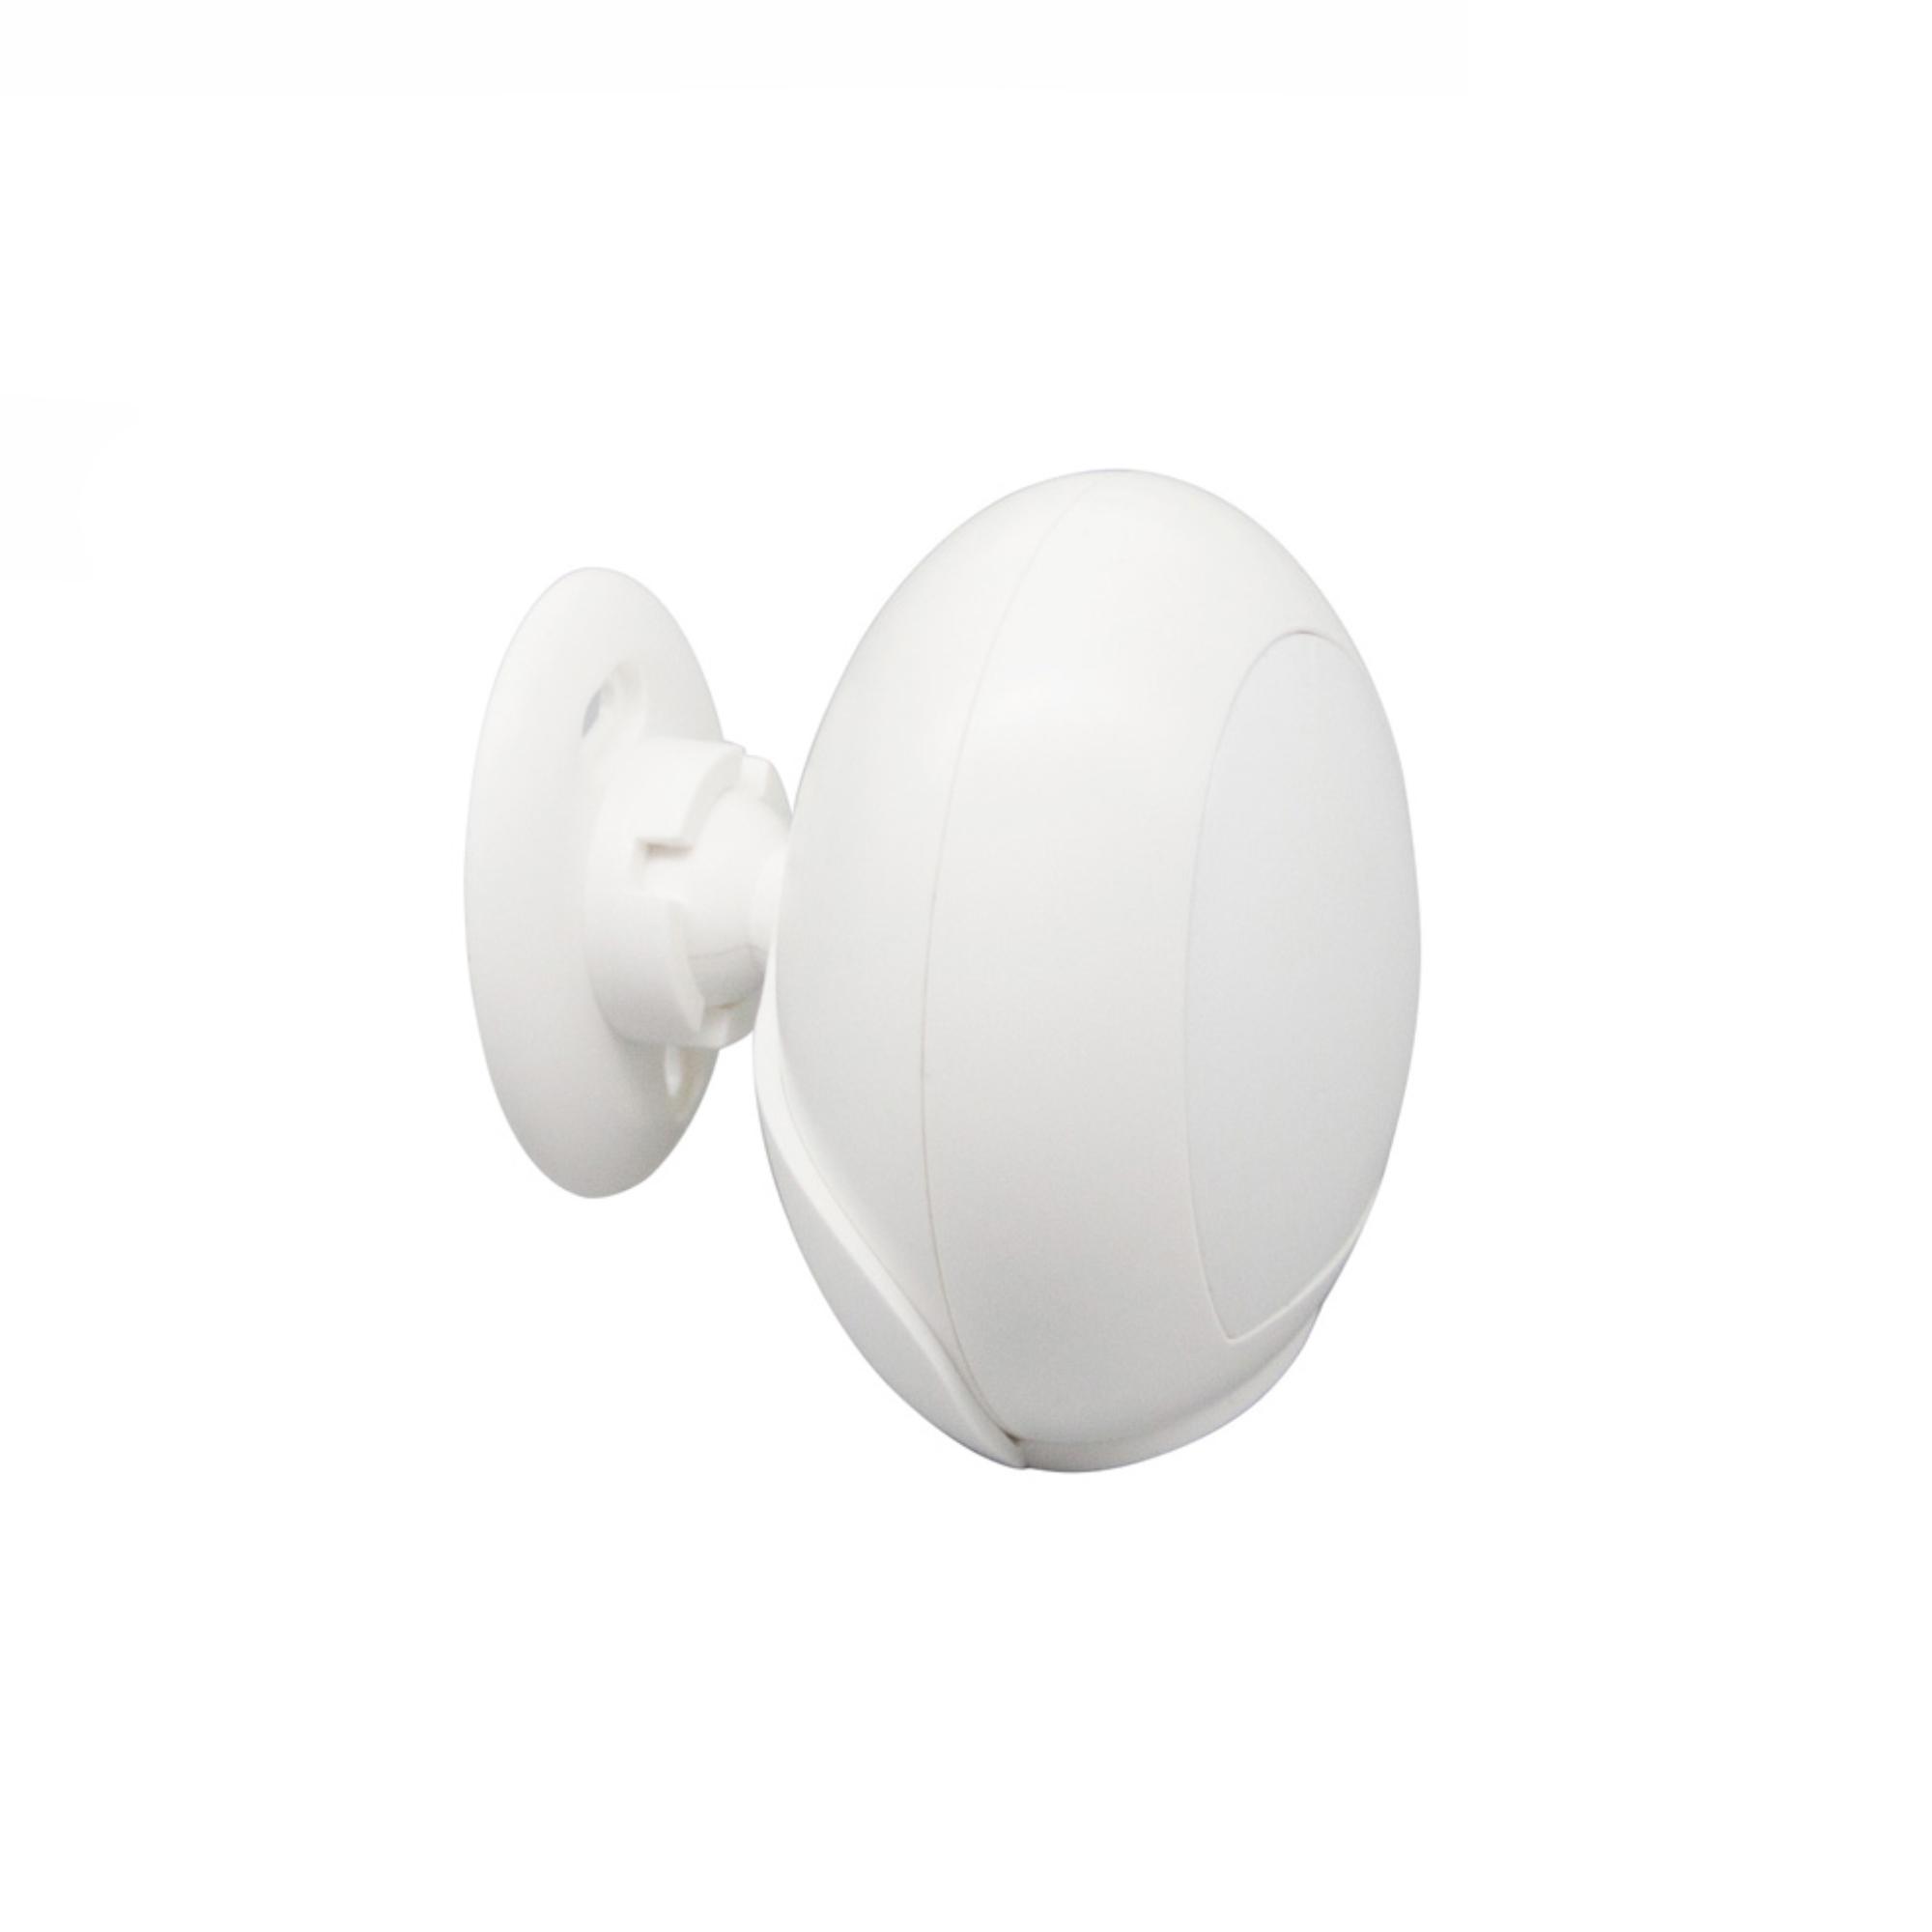 Sensref Magnetic Mounted Passive Infrared Motion Sensor